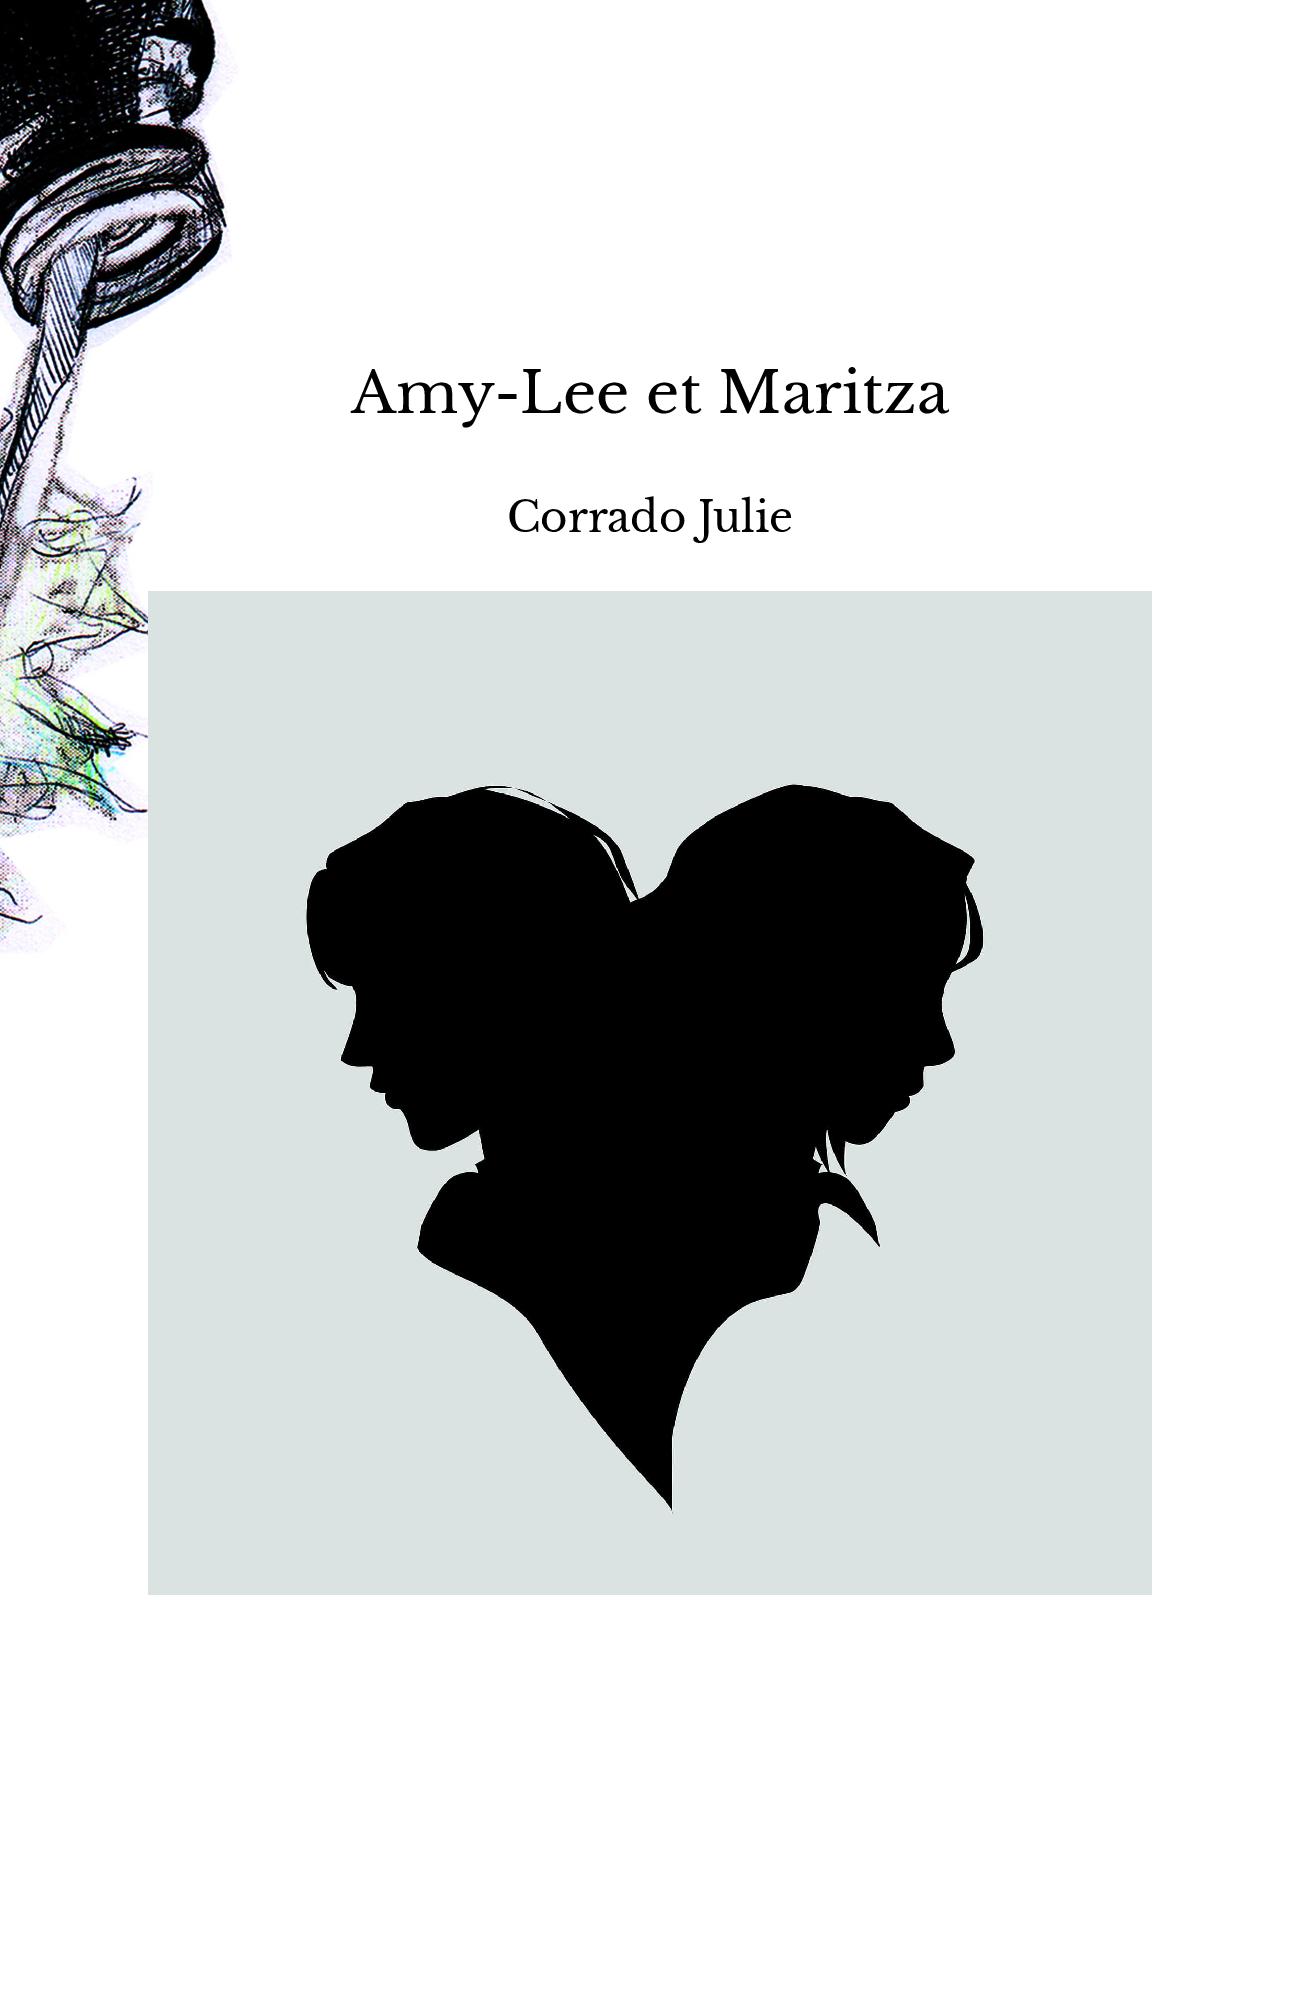 Amy-Lee et Maritza